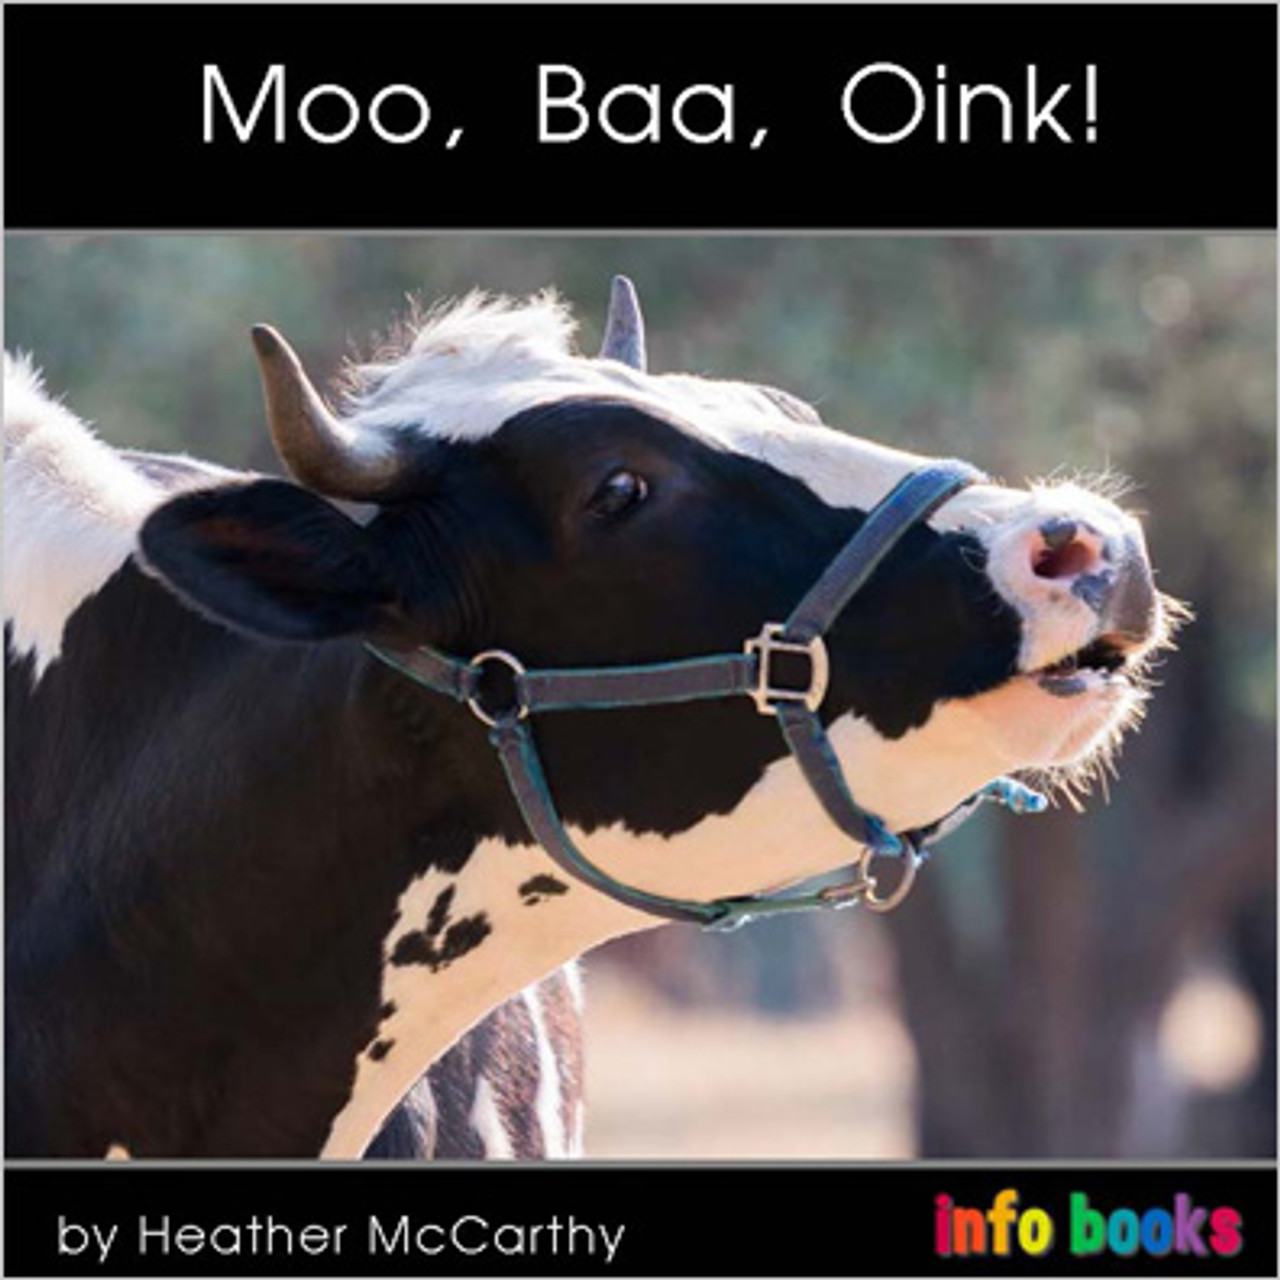 Moo, Baa, Oink! - Level B/2